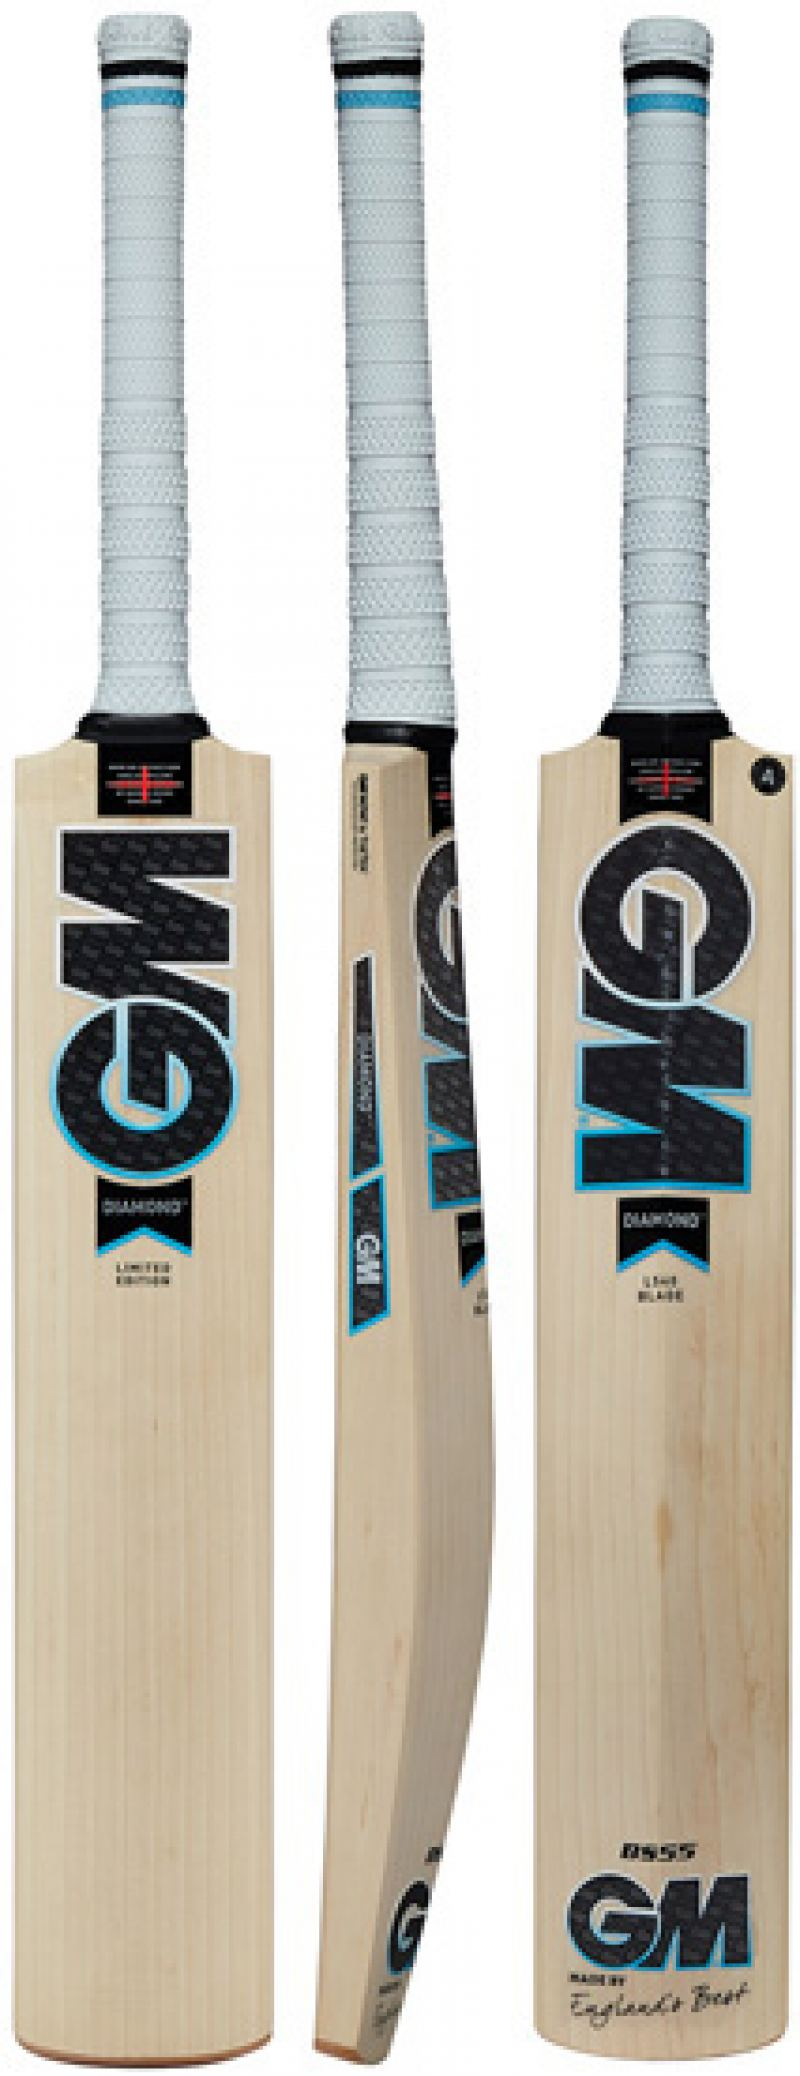 Gunn and Moore Diamond DXM 606 Junior Cricket Bat